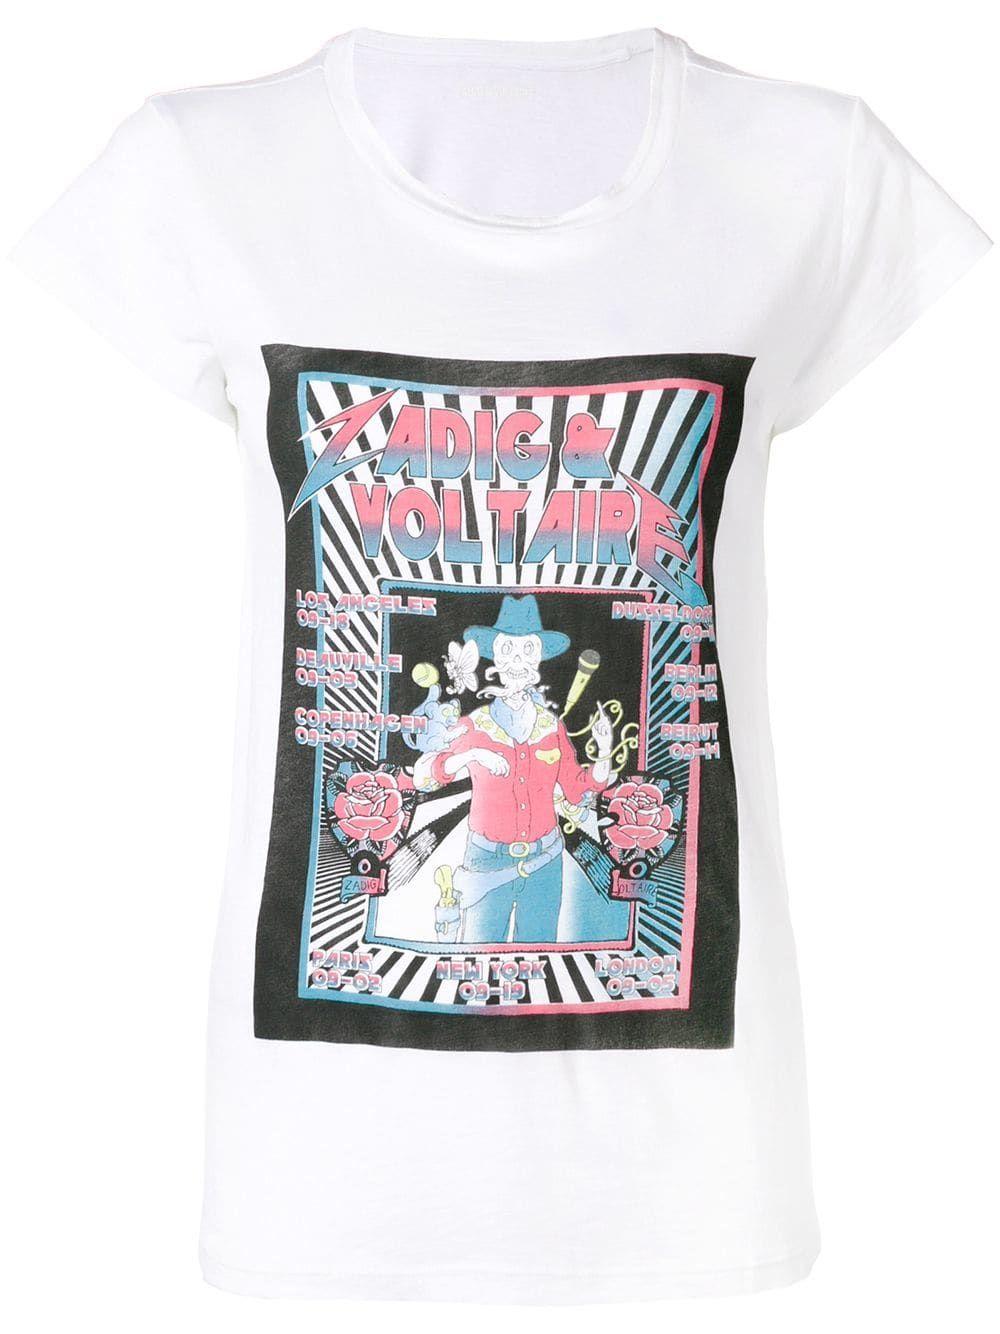 25621717e Zadig&Voltaire logo print T-shirt | VVV in 2019 | Zadig, voltaire, T ...